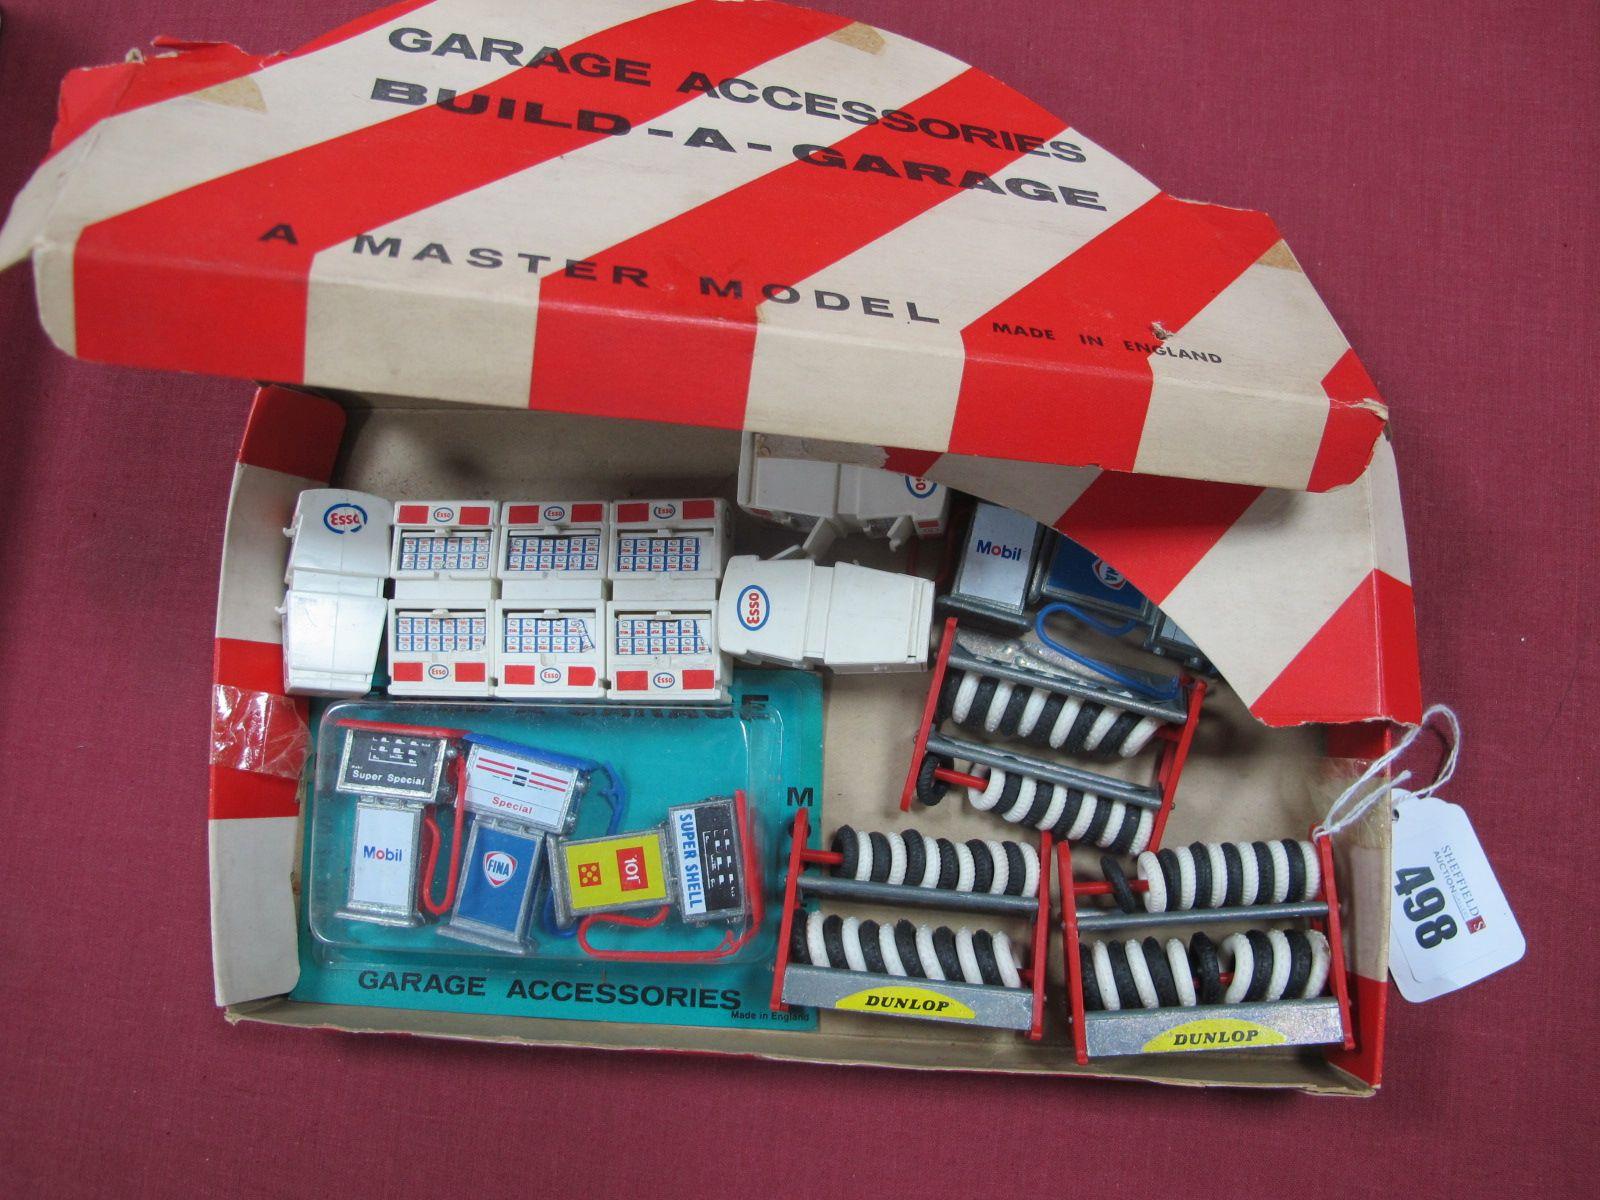 "Master Model Build A Garage, garage accessories, three petrol pumps in original pack, three ""Dunlop"""